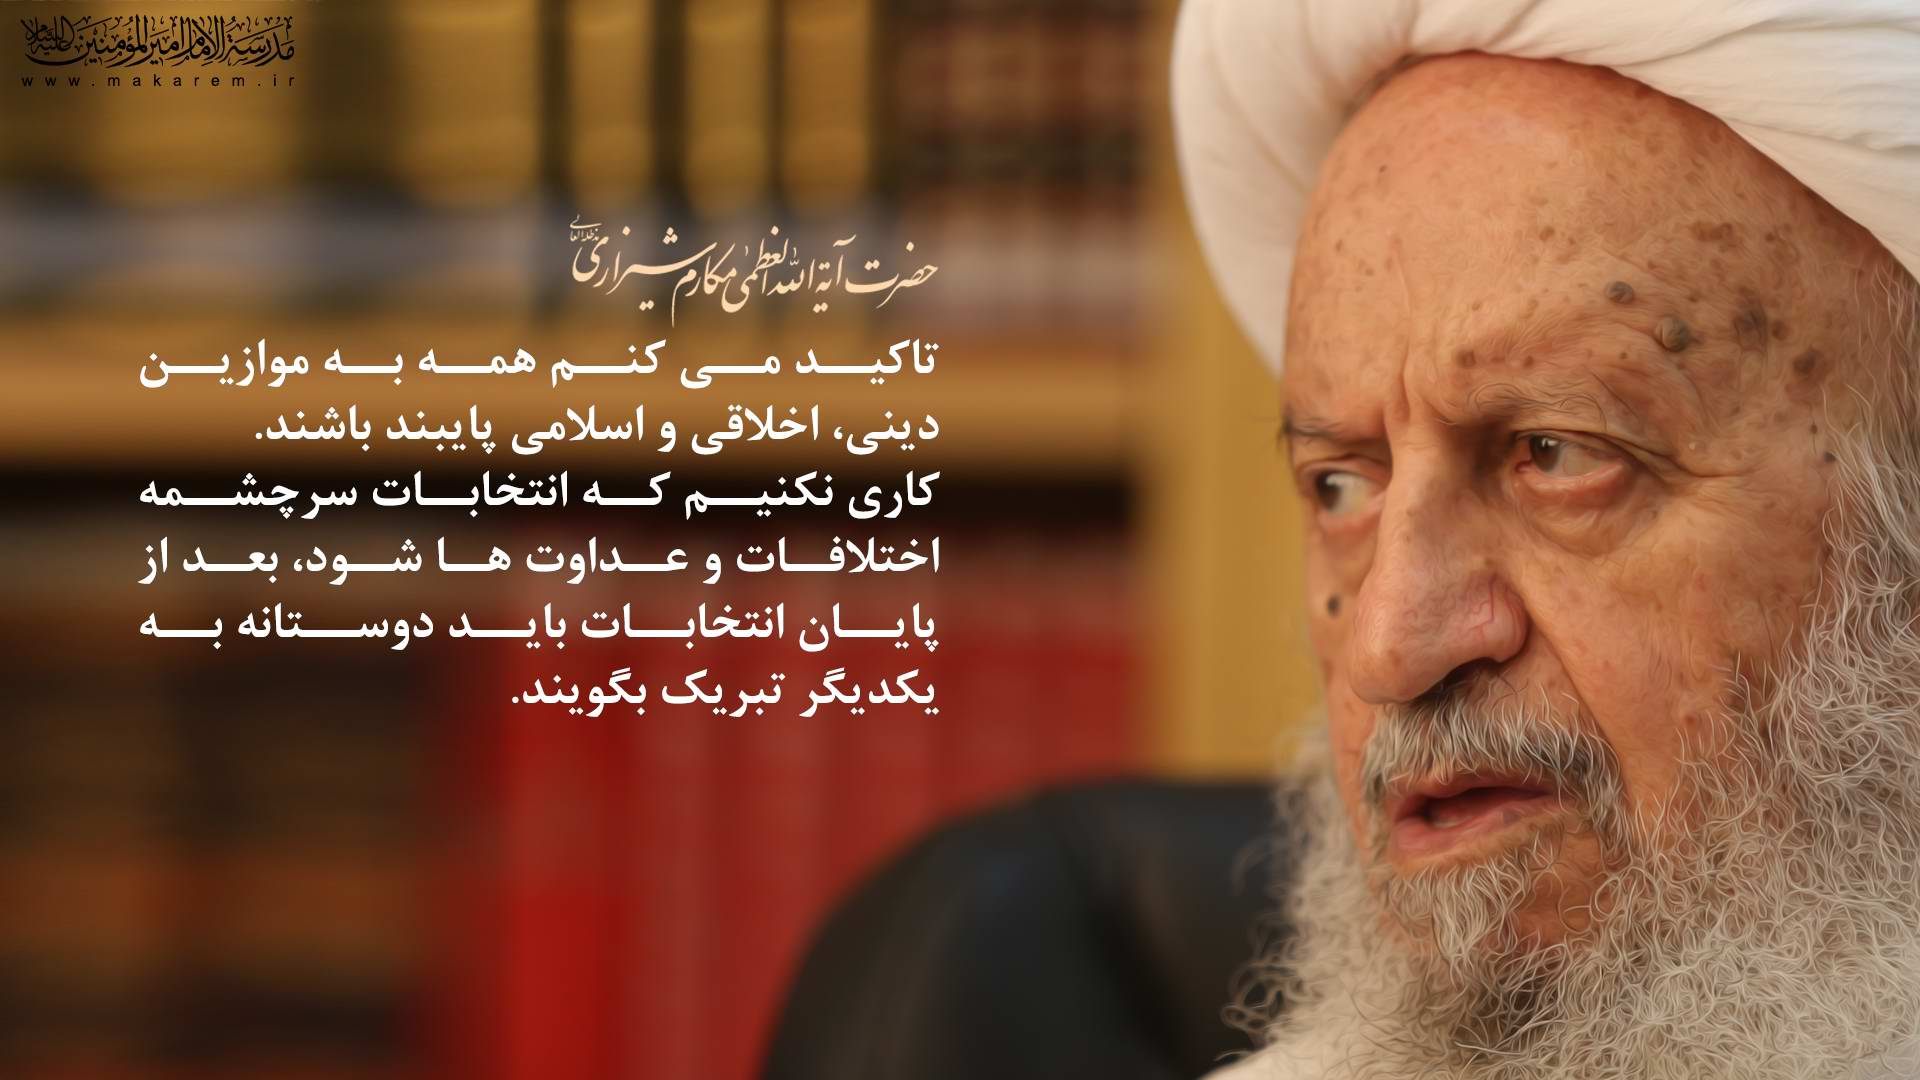 انتخابات 01-مدرسه الامام امیر المومنین (ع)